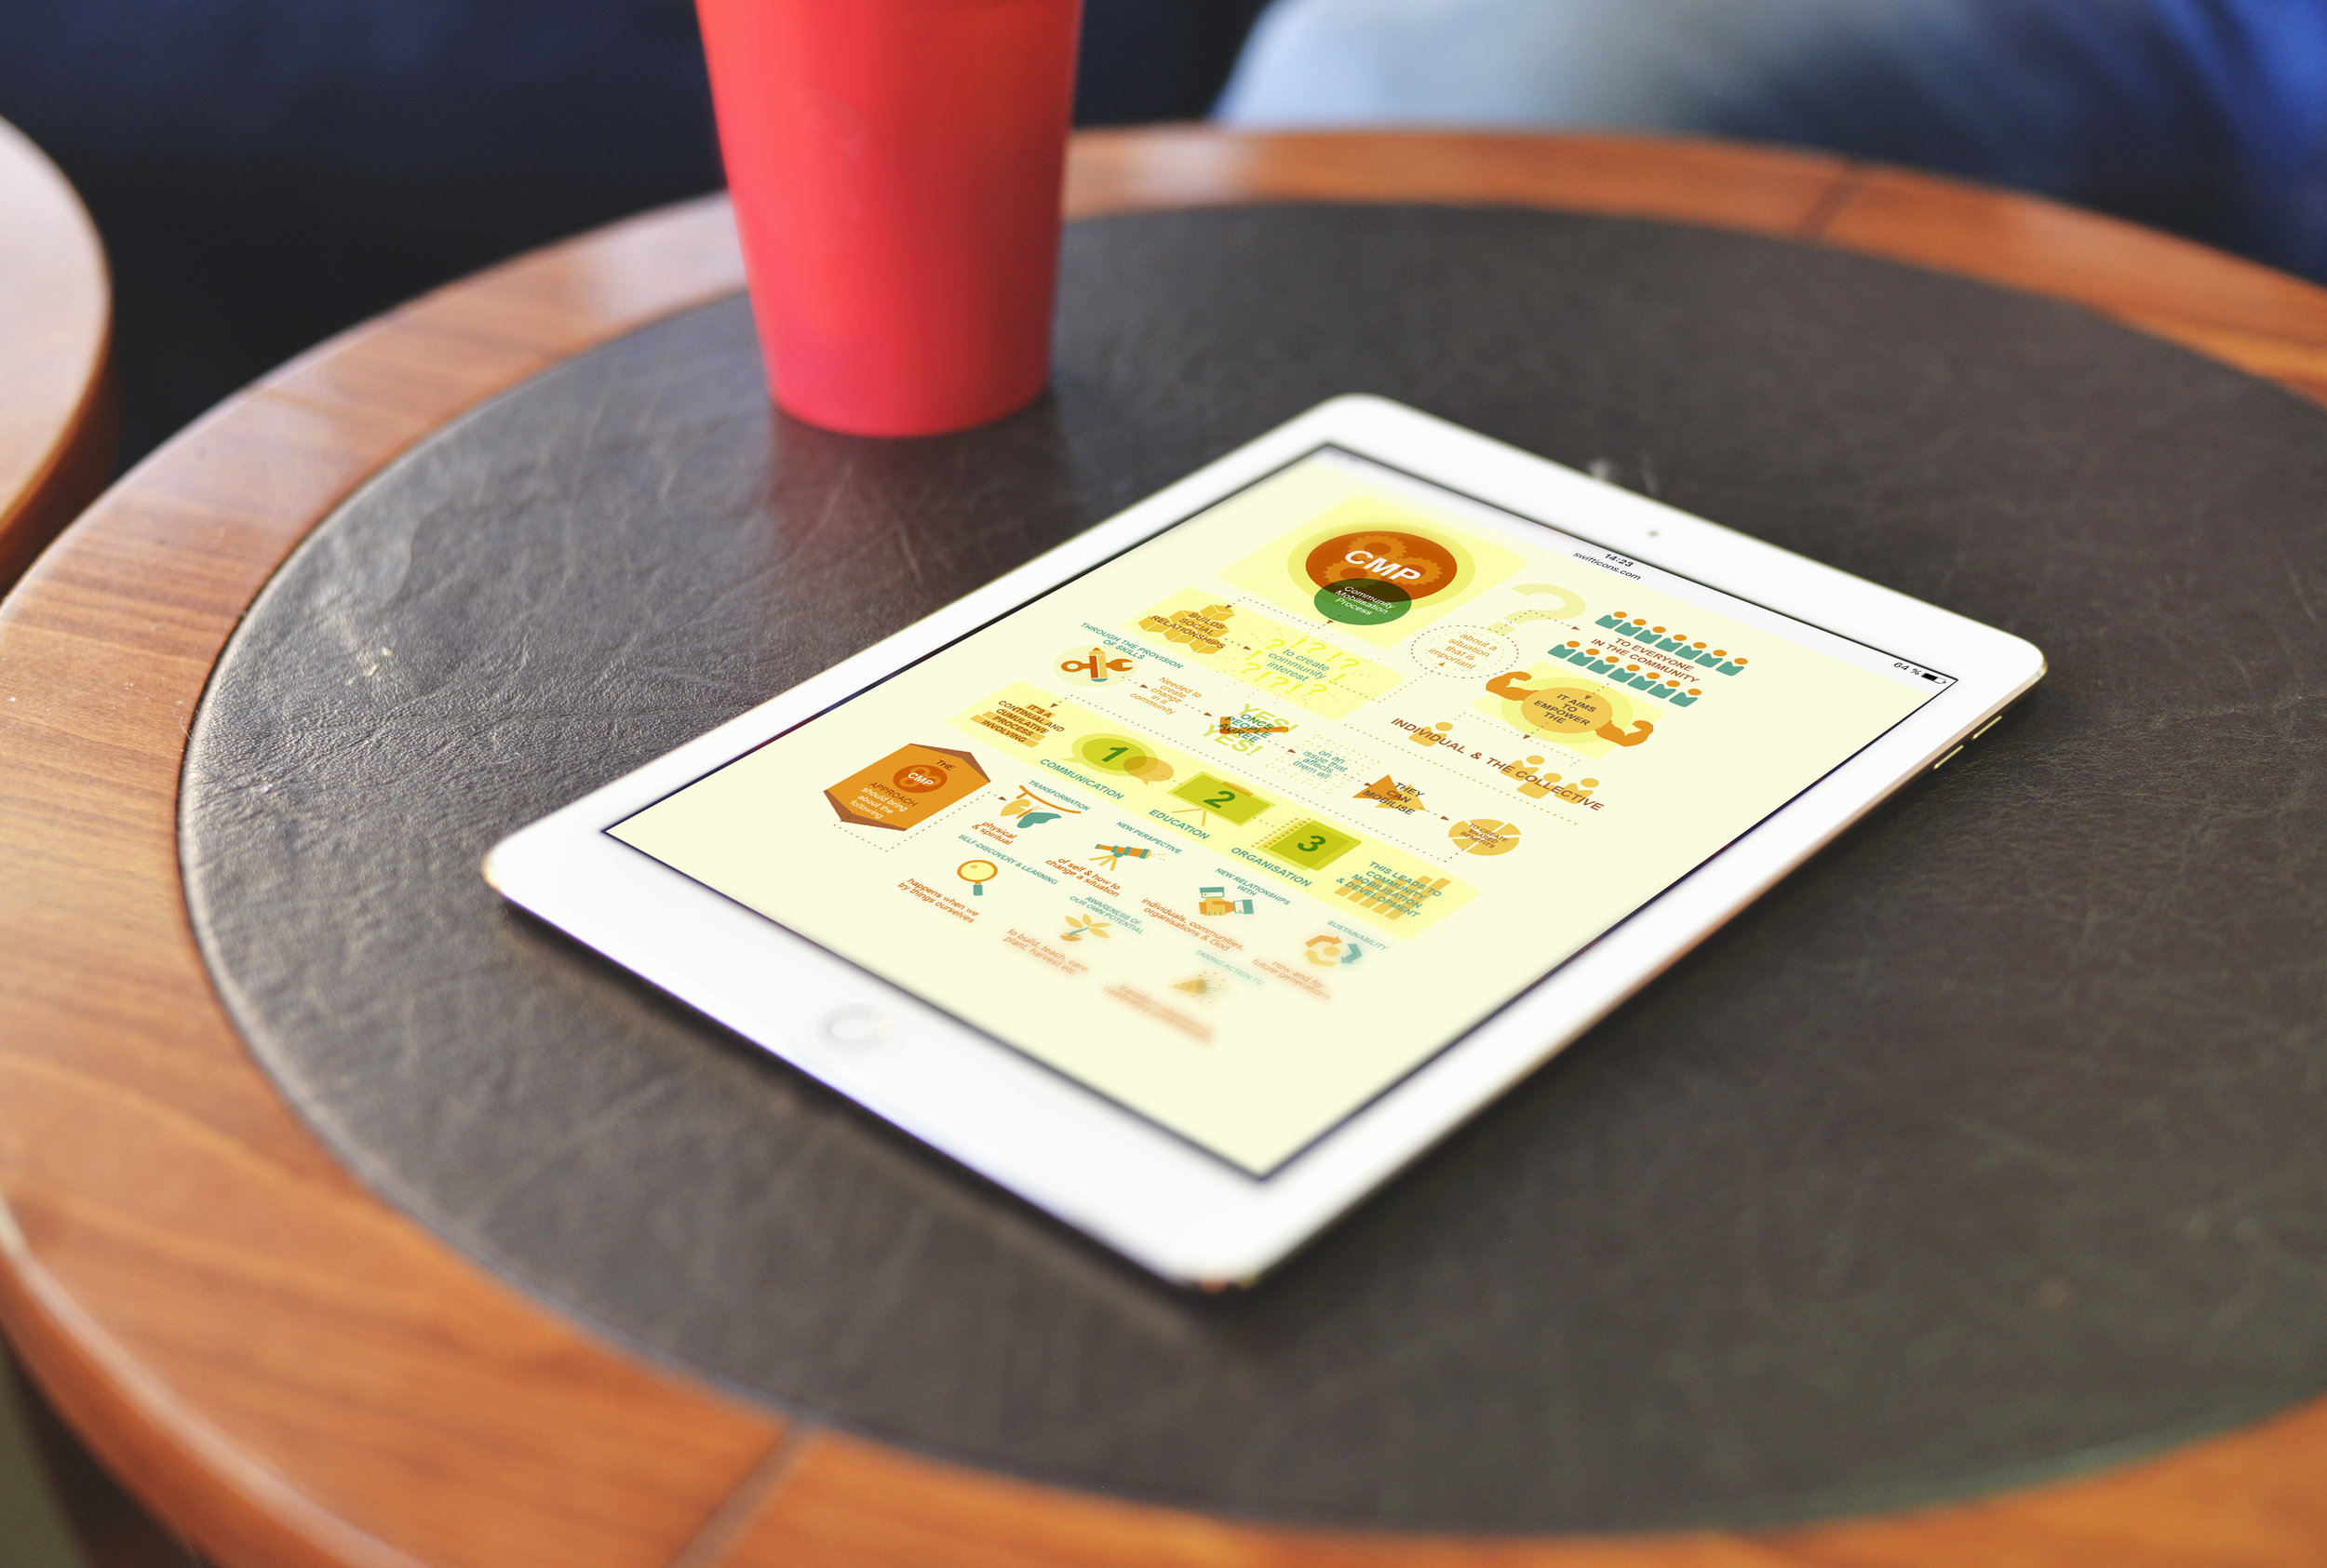 iPad_in situ.jpg